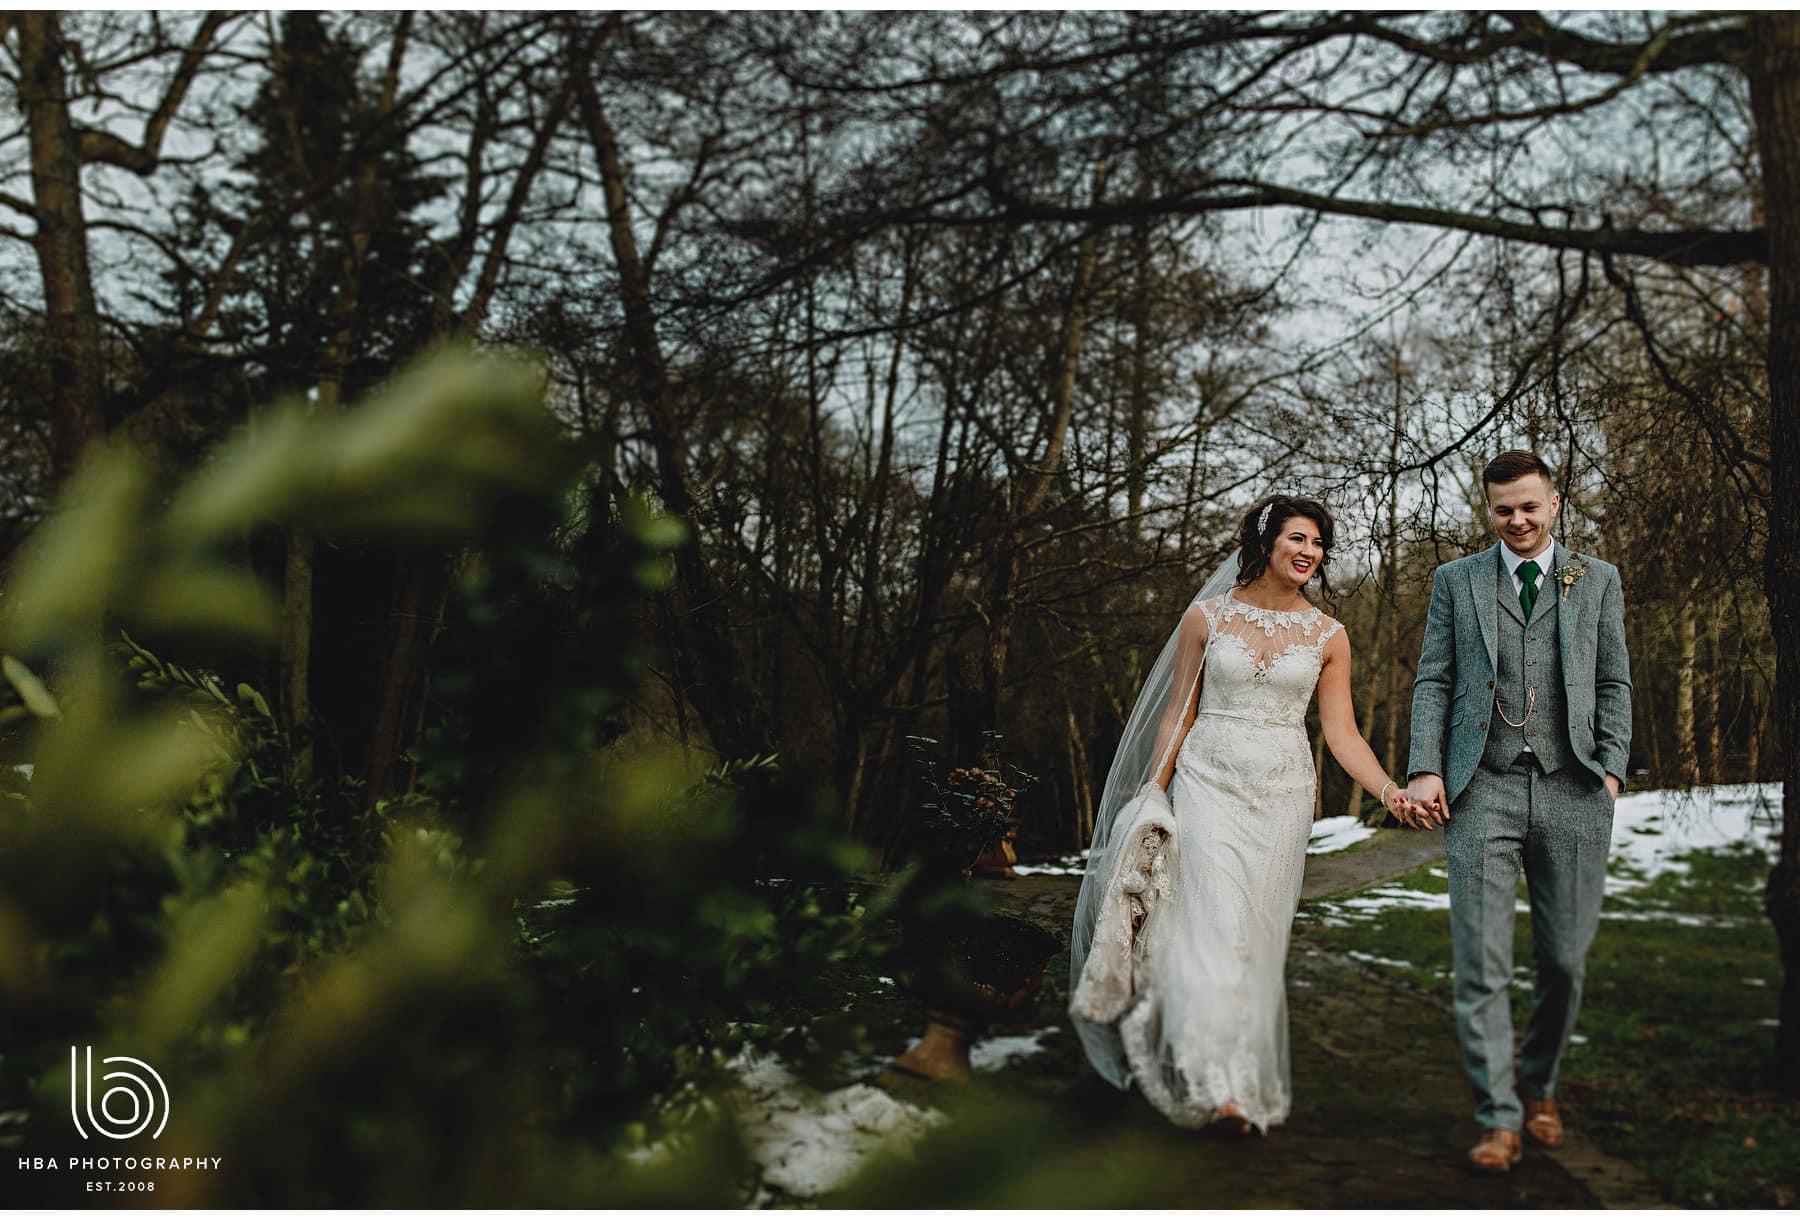 the bride & groom walking in the snow